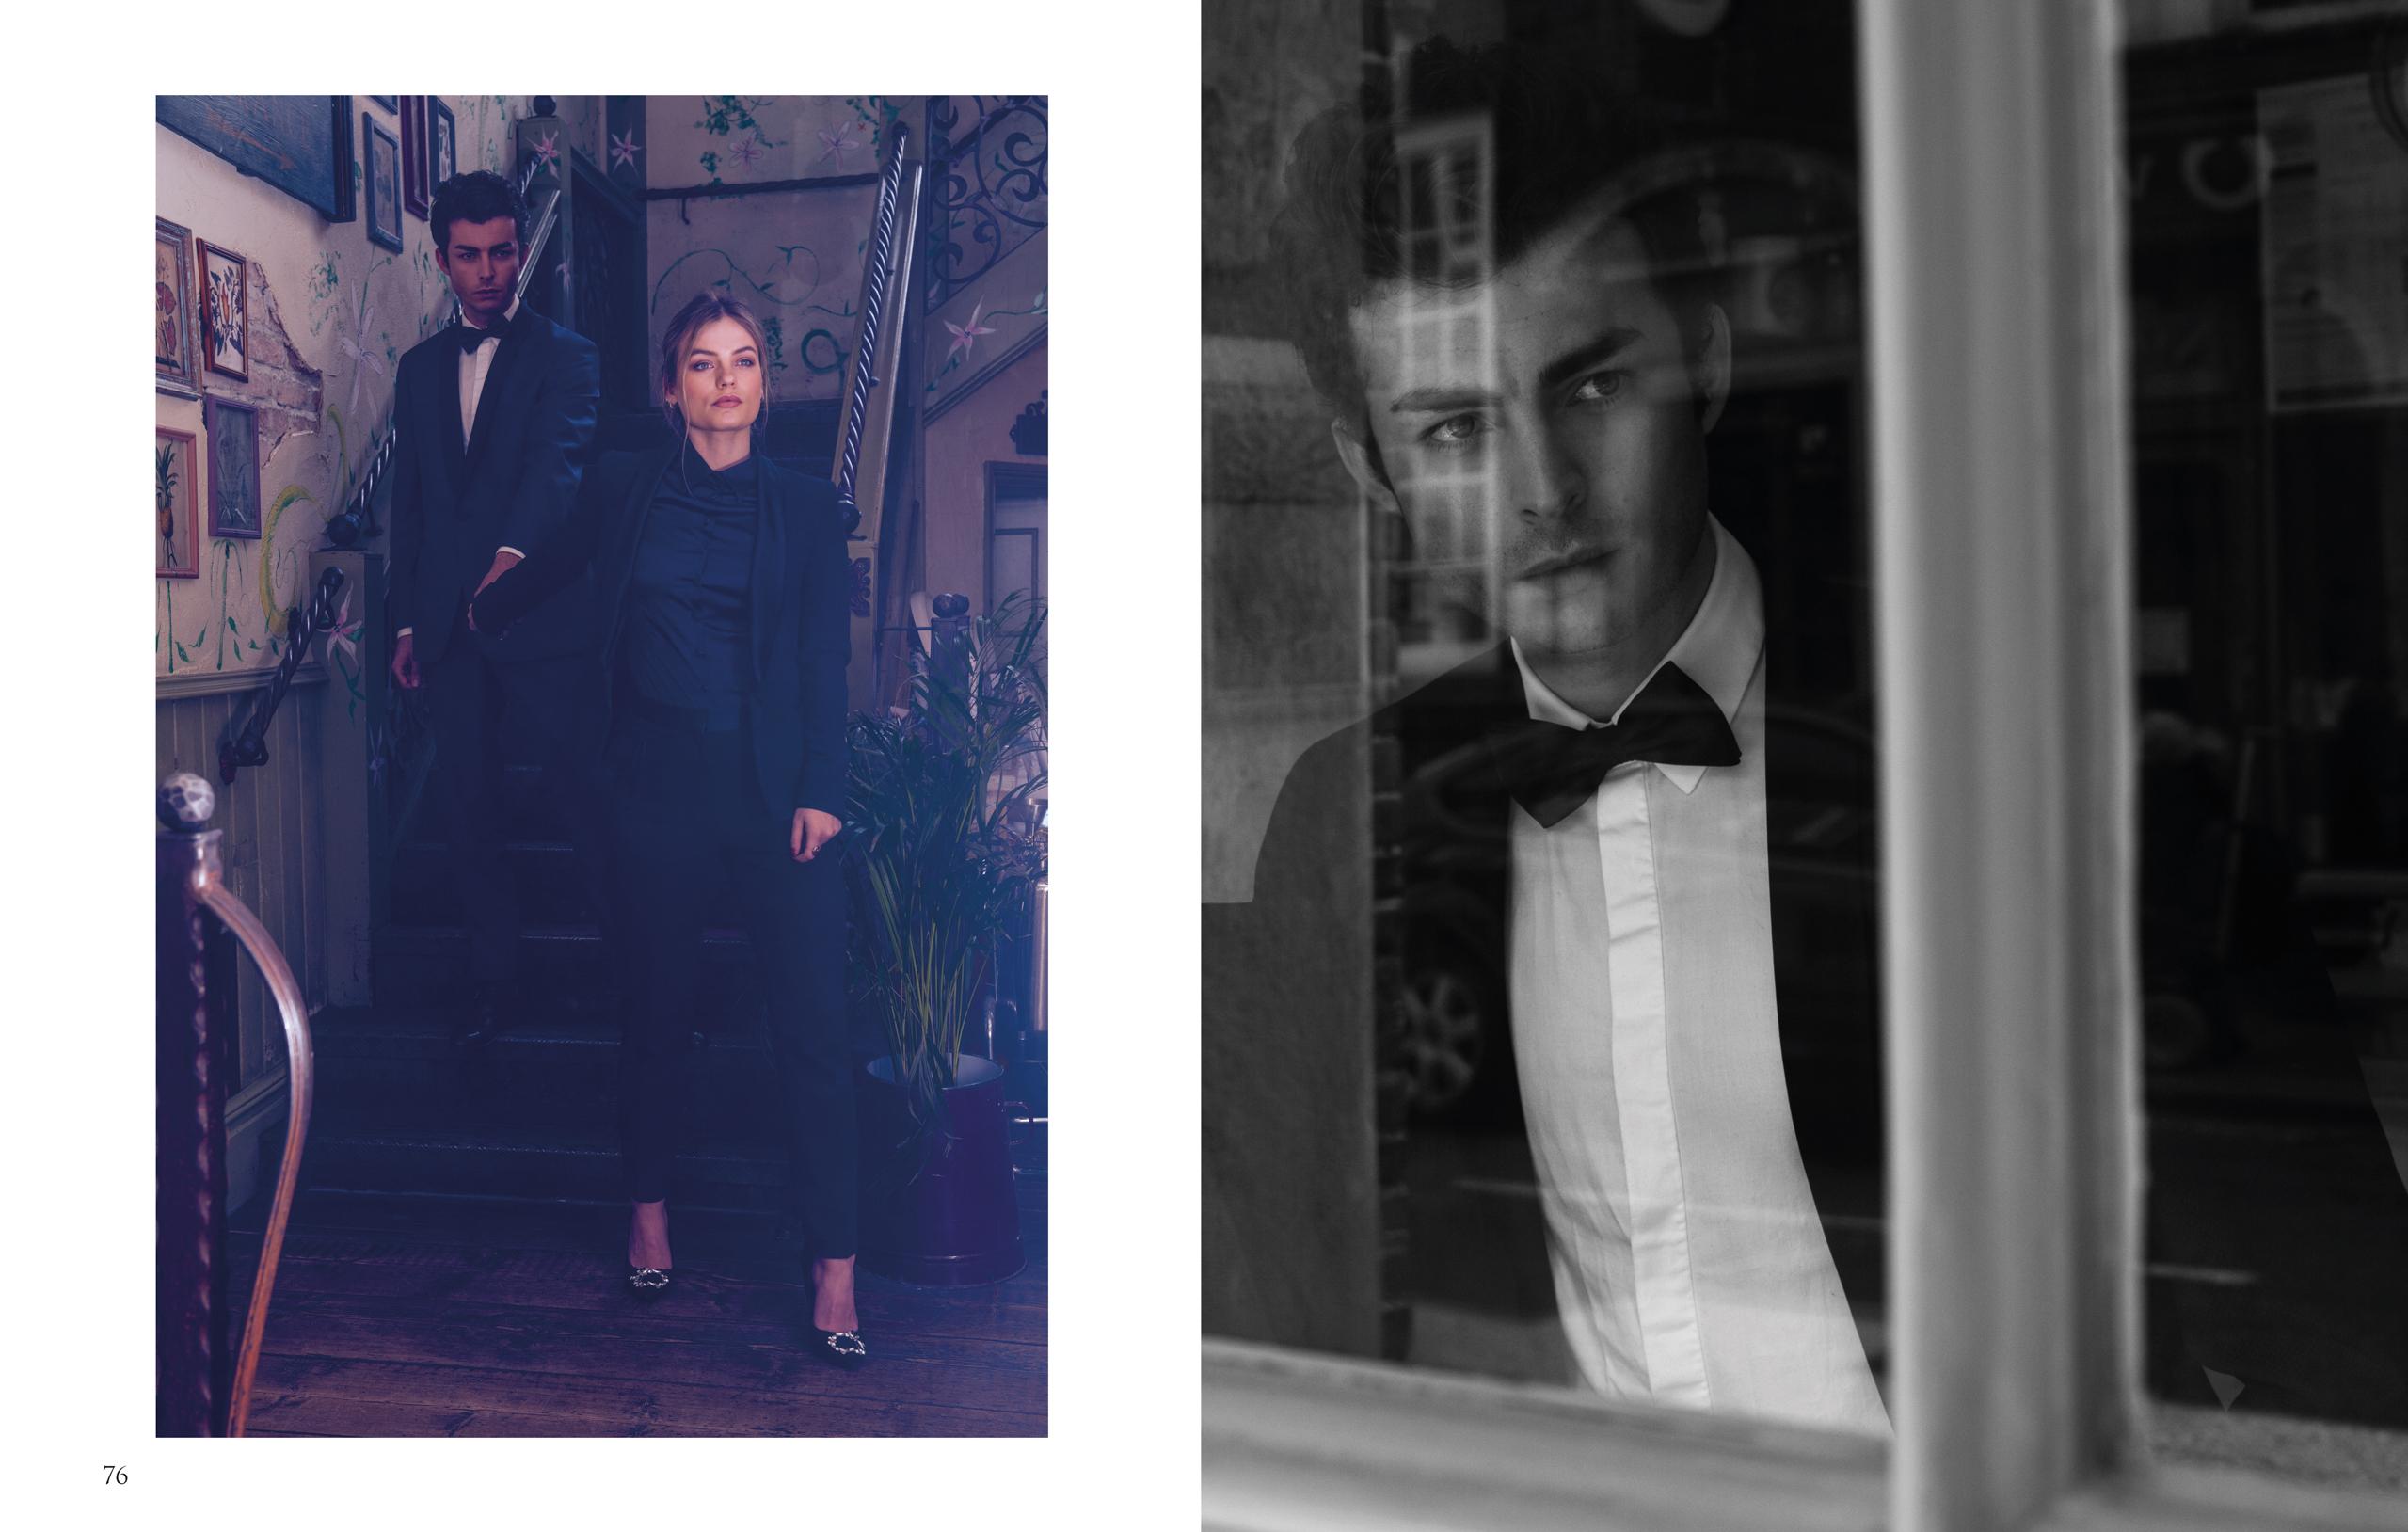 Fashion editorial portrait for LaPalme magazine by Farnham, Surrey based photographer James Muller